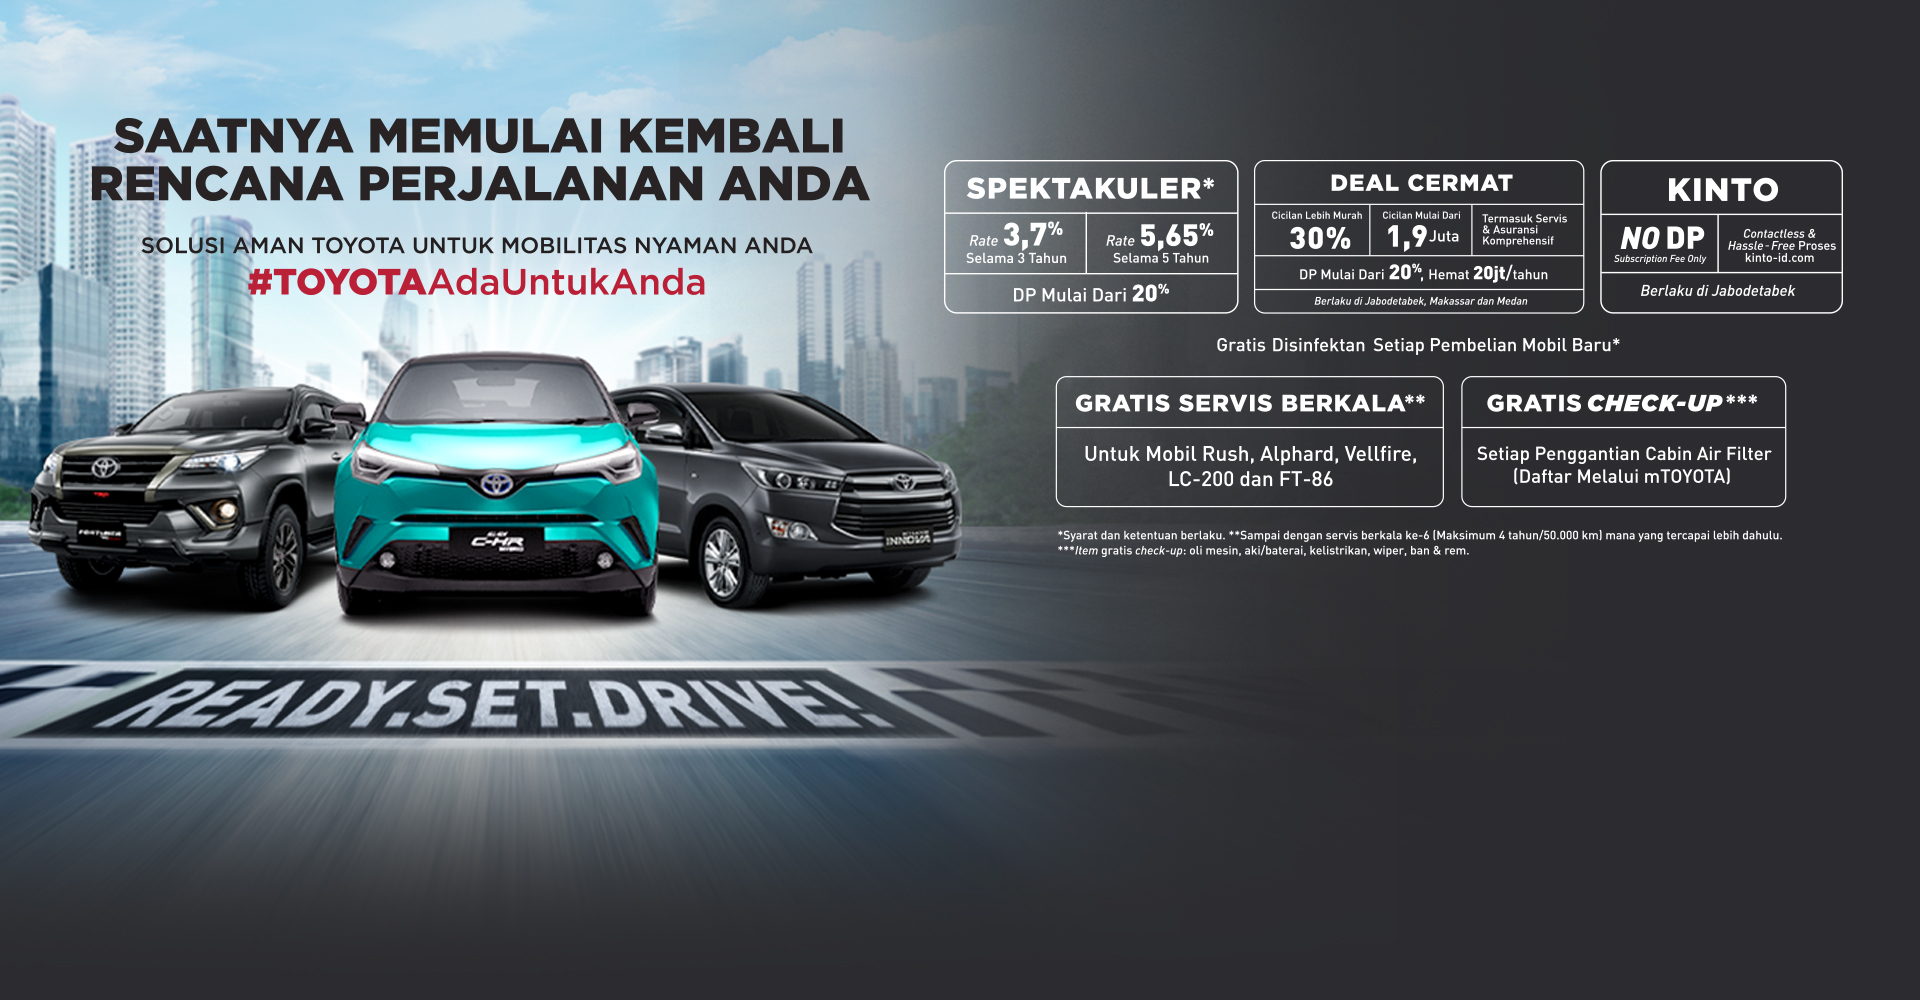 Dealer Toyota Bali, Toyota Auto2000 Denpasar Bali, Toyota Denpasar Bali melayani Cash & Kredit Toyota Bali, Promo Harga Toyota Bali, Sales Toyota Bali.